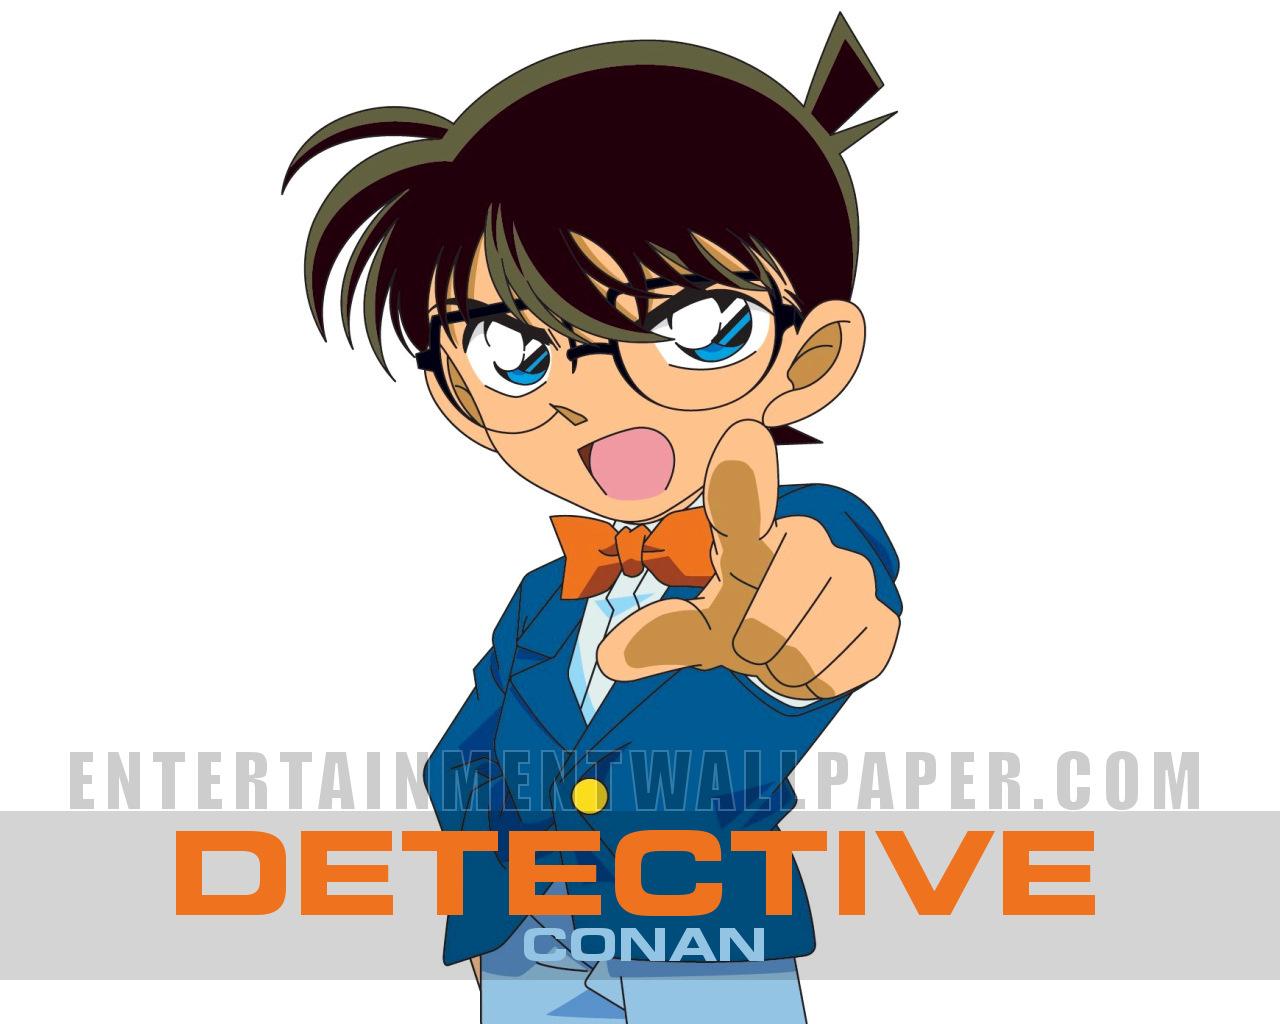 http://1.bp.blogspot.com/-GIZyTFFe6jc/T9jHNMCE49I/AAAAAAAACKg/iph_k3N9daU/s1600/detective-conan.jpg